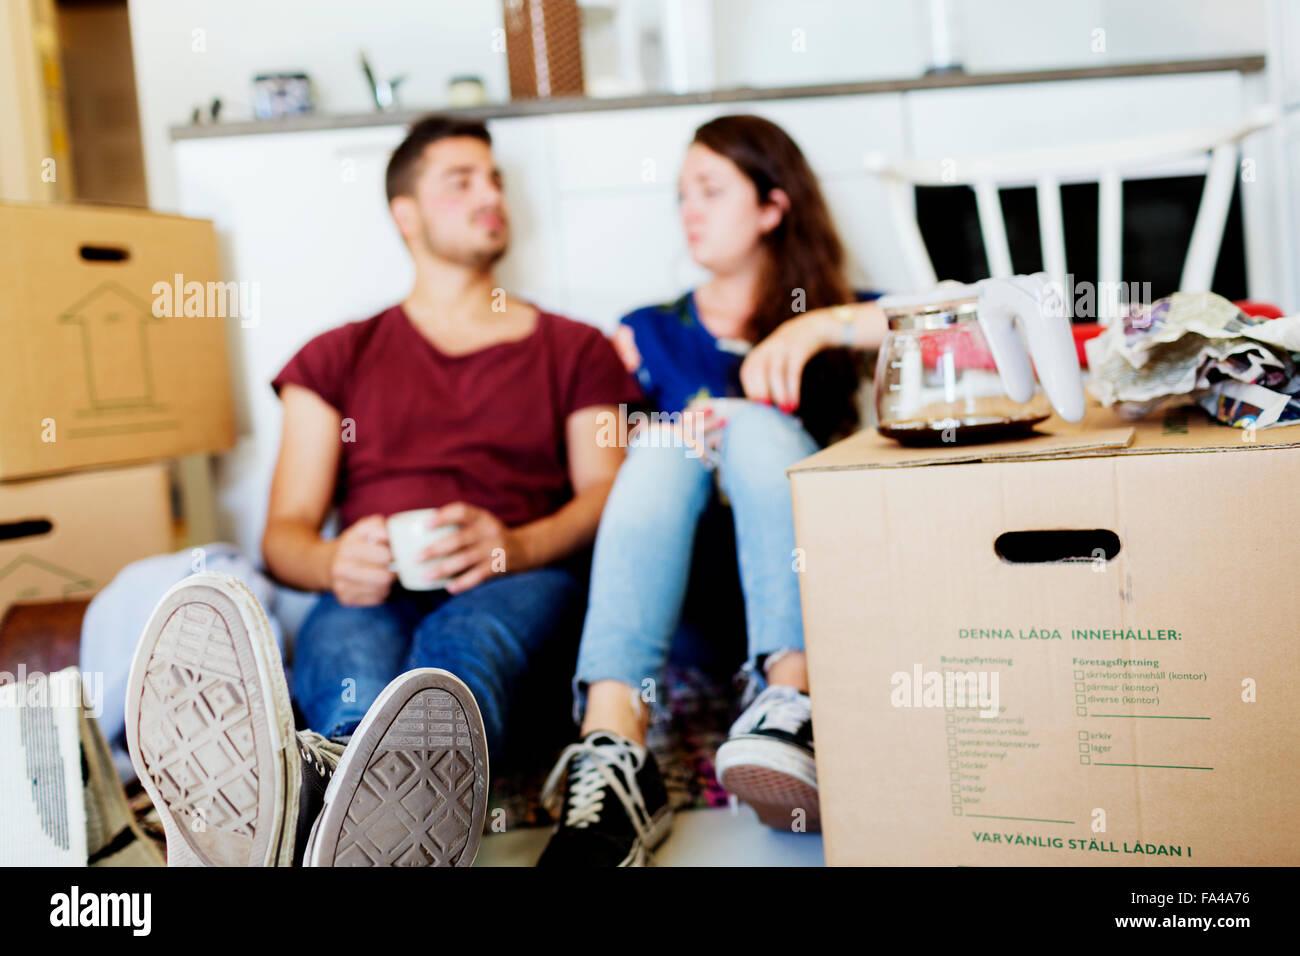 Take Break Coffeebreak : Young couple taking coffee break in new house stock photo